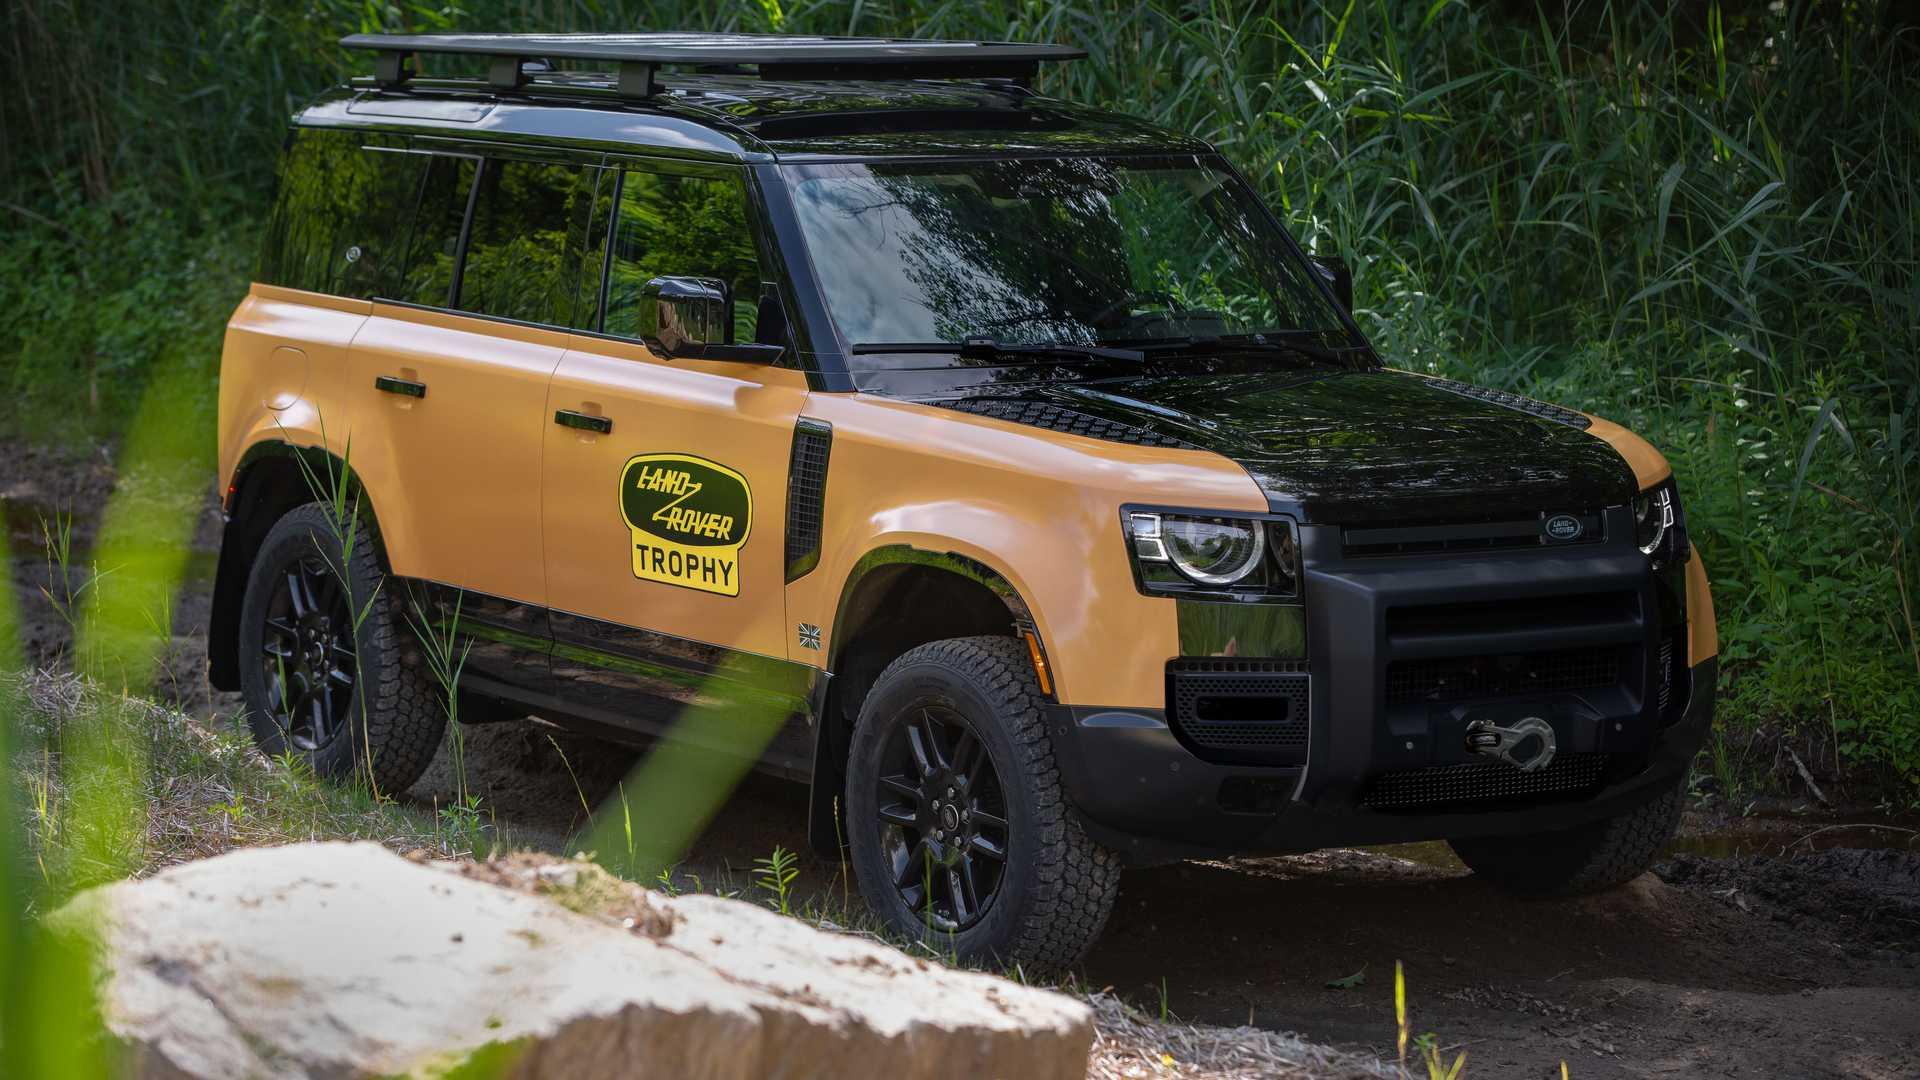 Land-Rover-Defender-Trophy-Edition-2